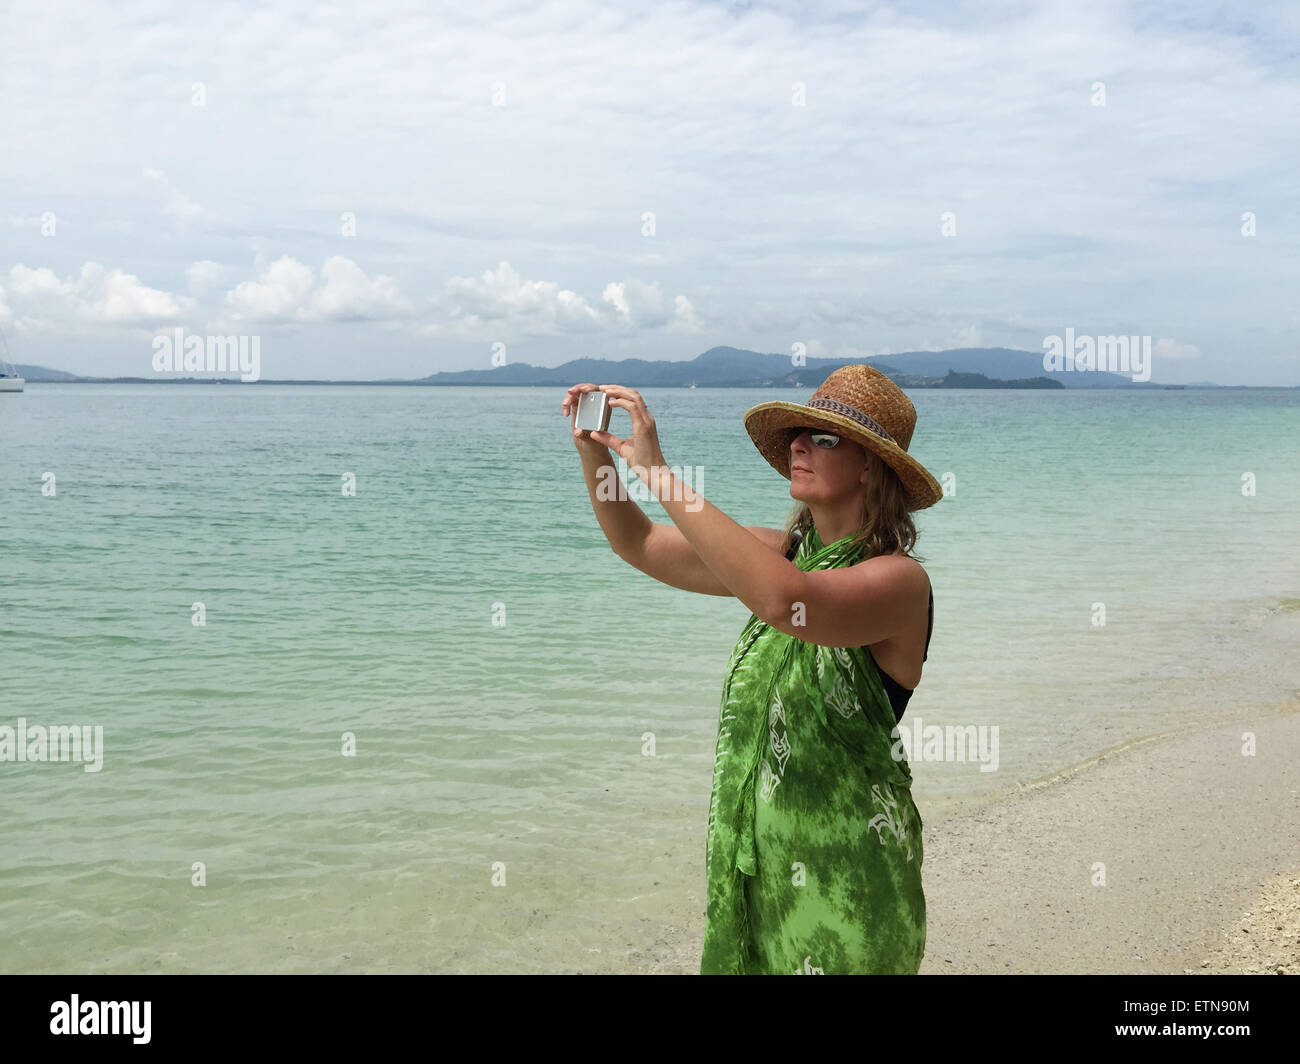 Woman standing on beach taking a photo, Phuket, Thailand Stock Photo